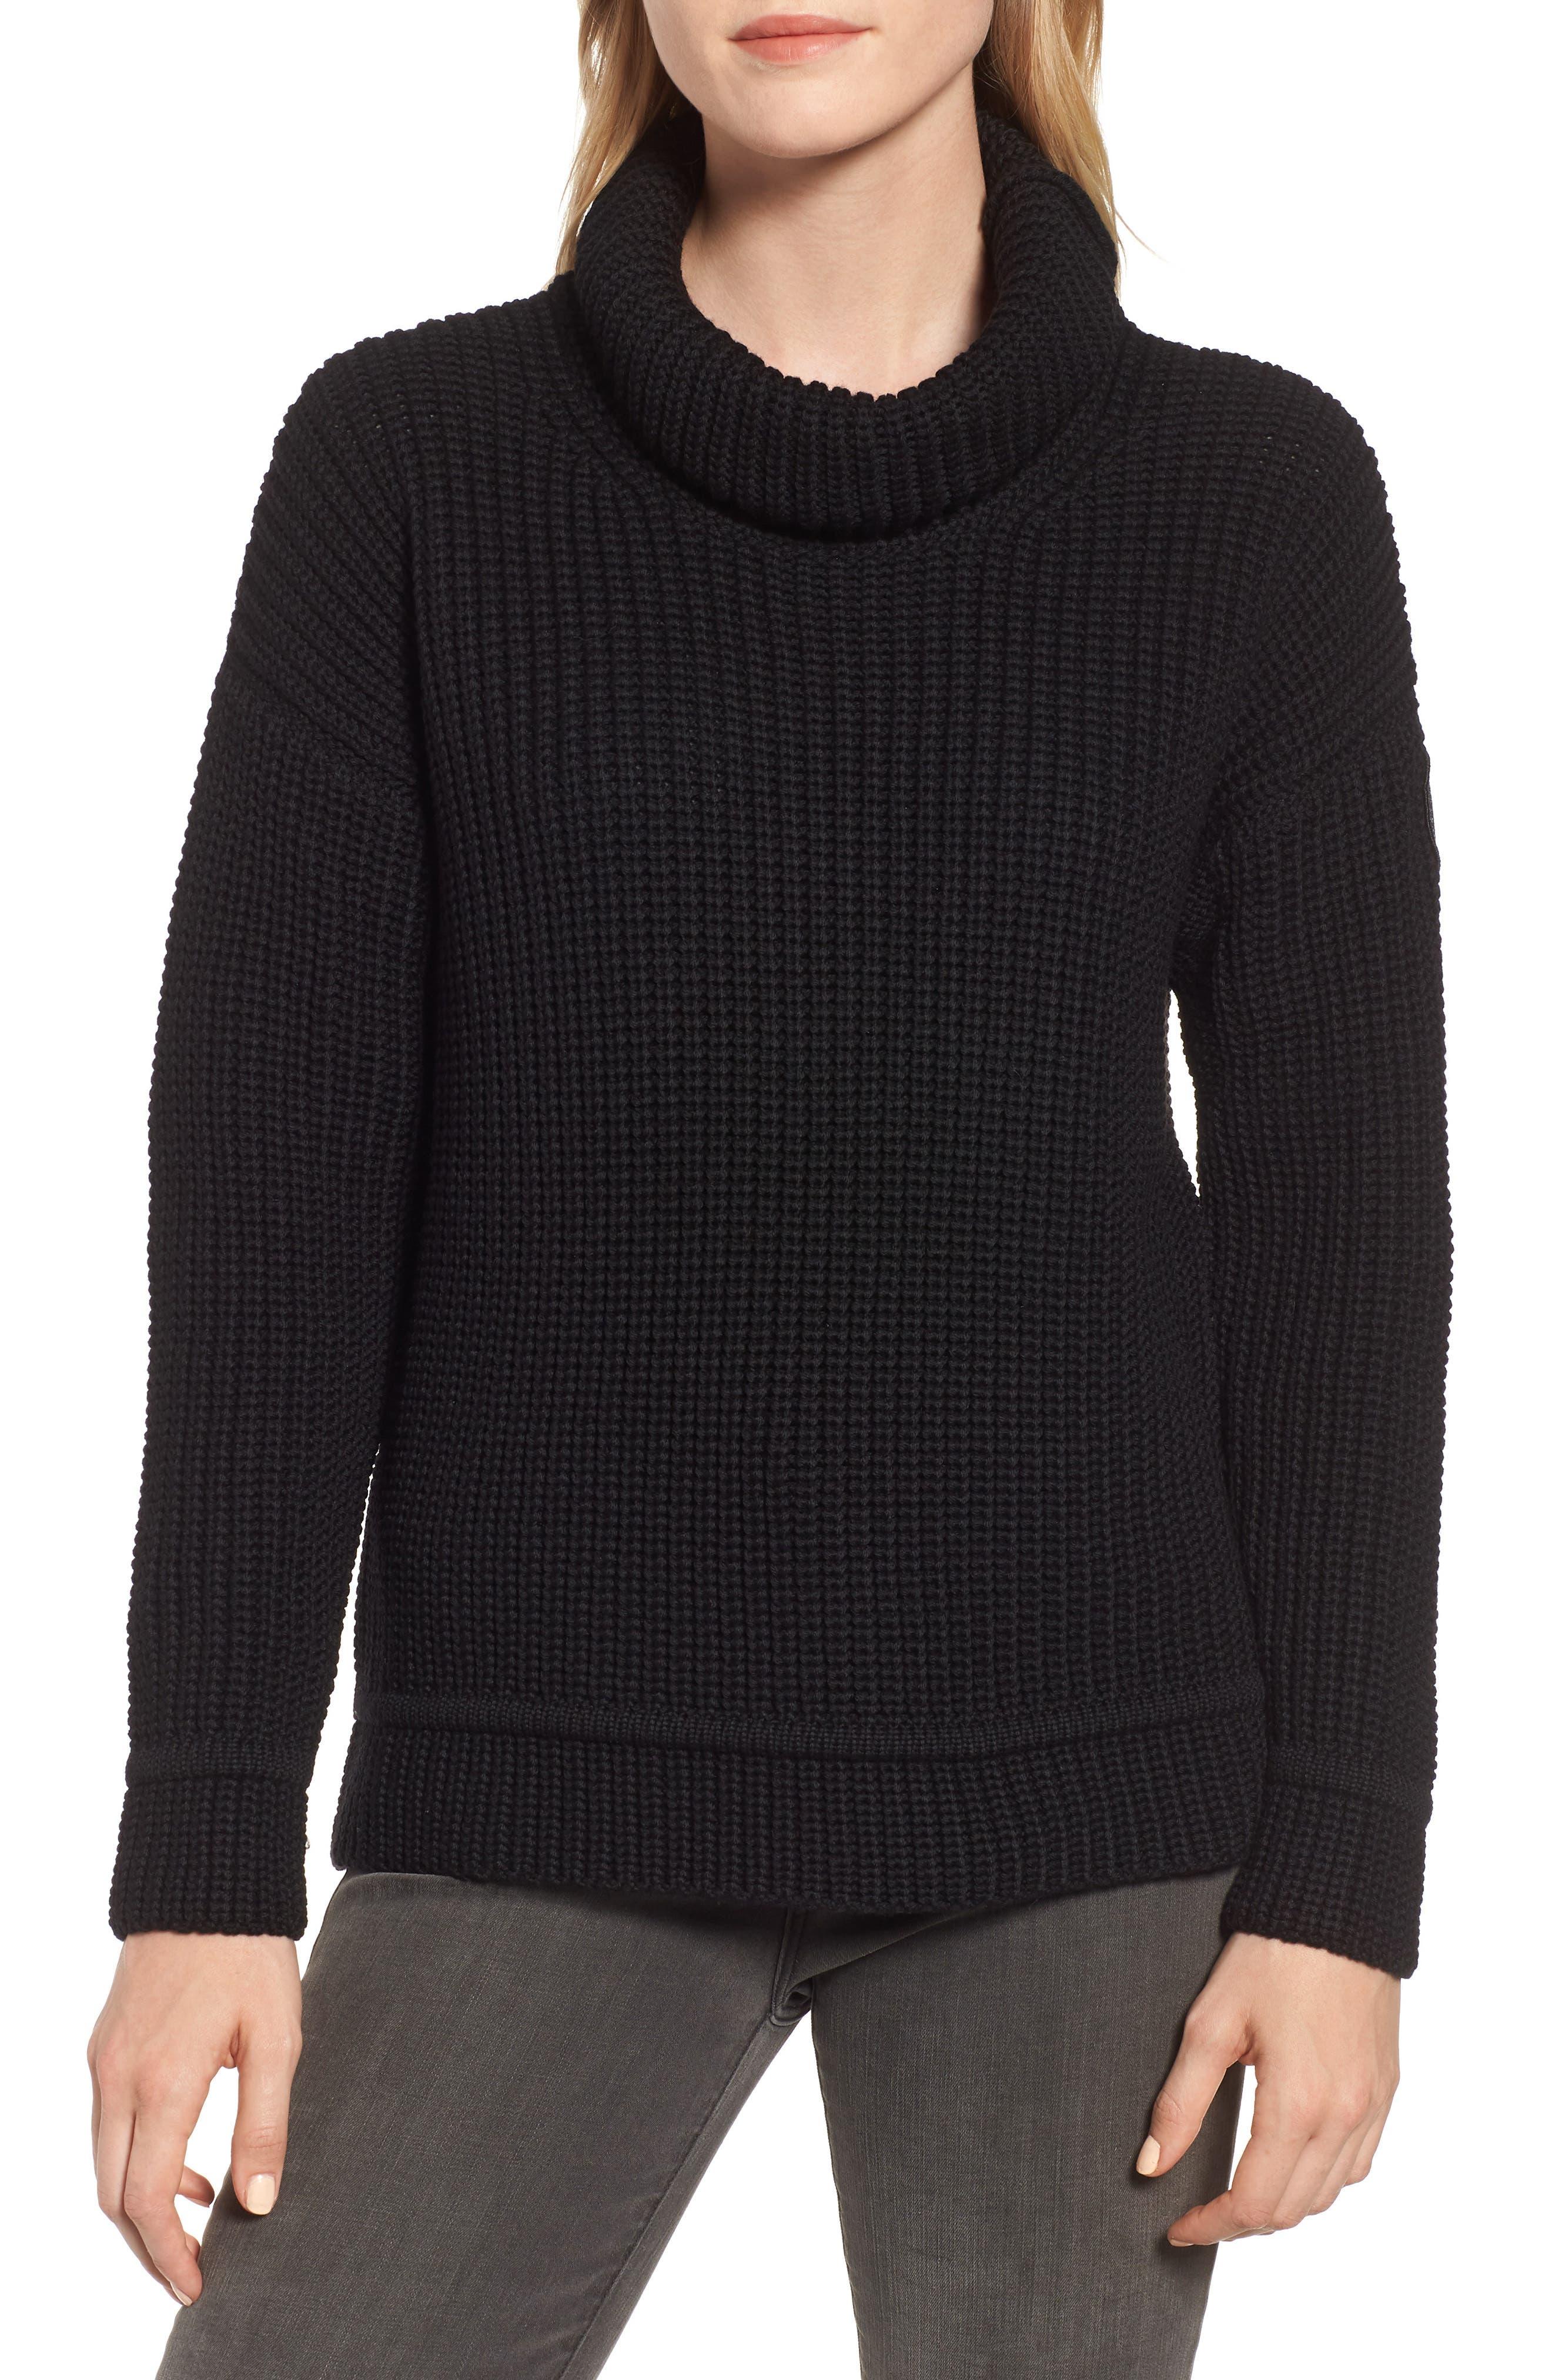 Williston Wool Turtleneck Sweater in Black